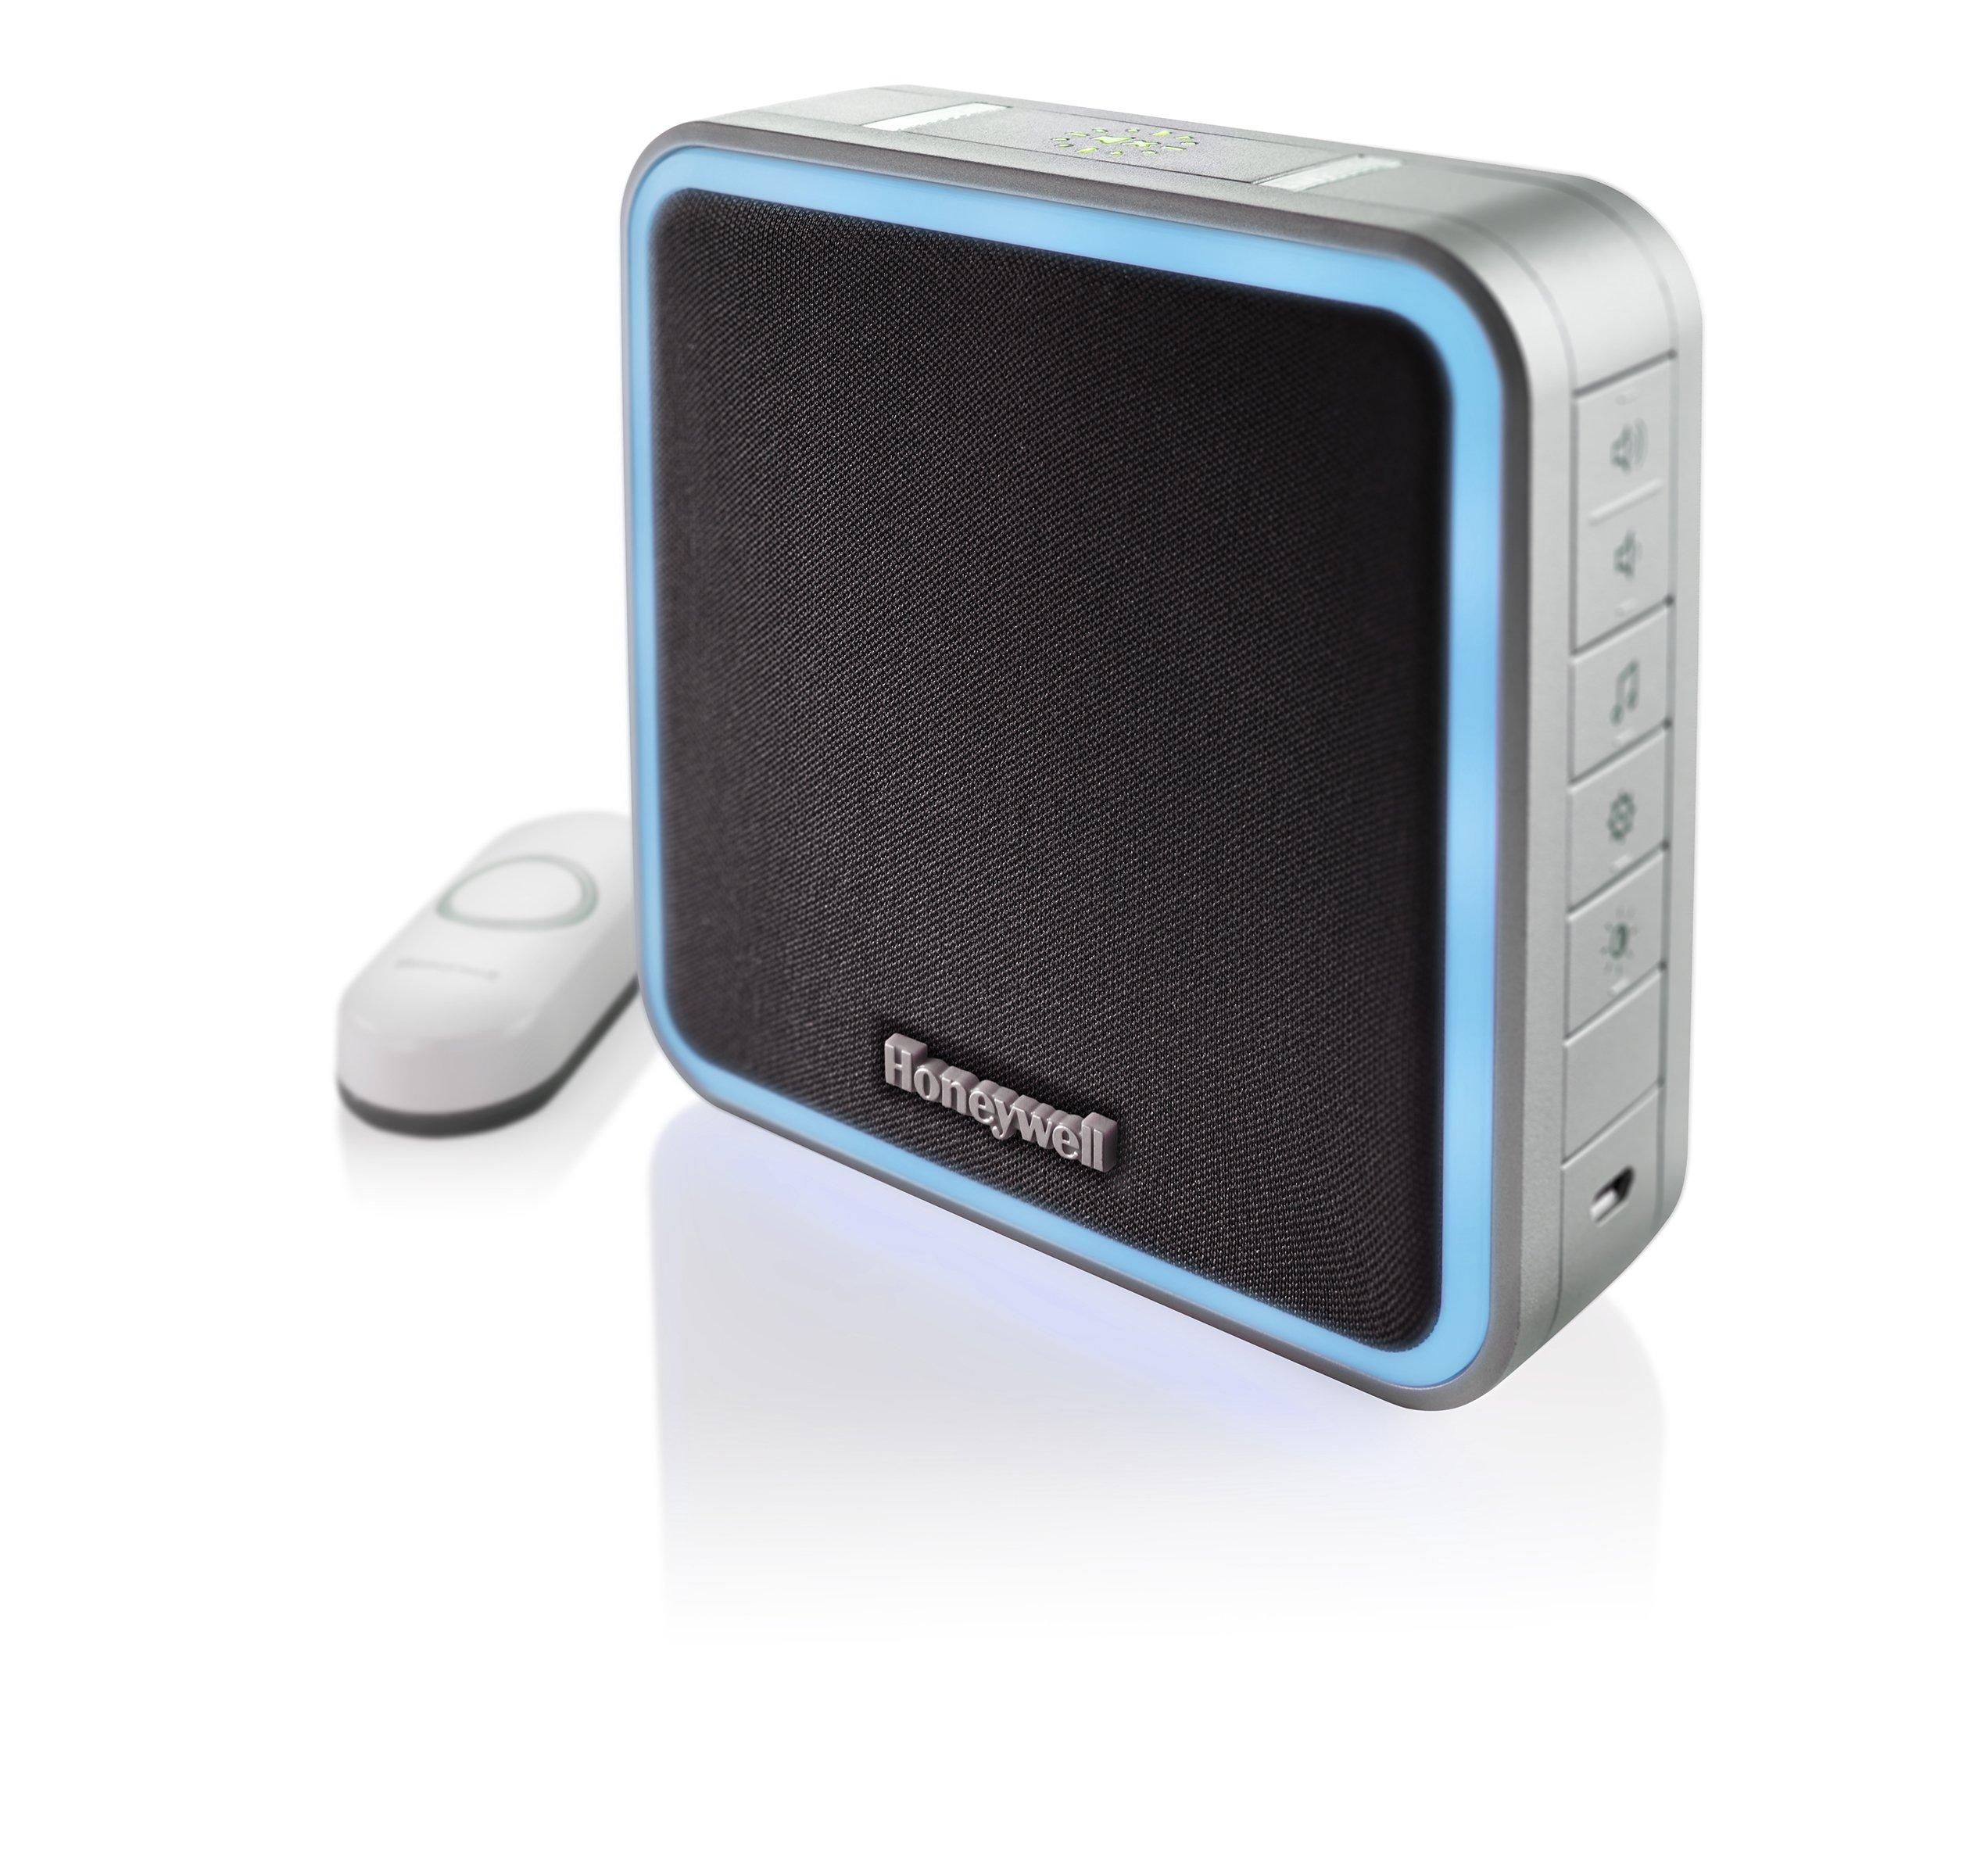 Honeywell RDWL917AX2000/E Series 9 Portable Wireless Doorbell / Door Chime & Push Button by Honeywell (Image #3)